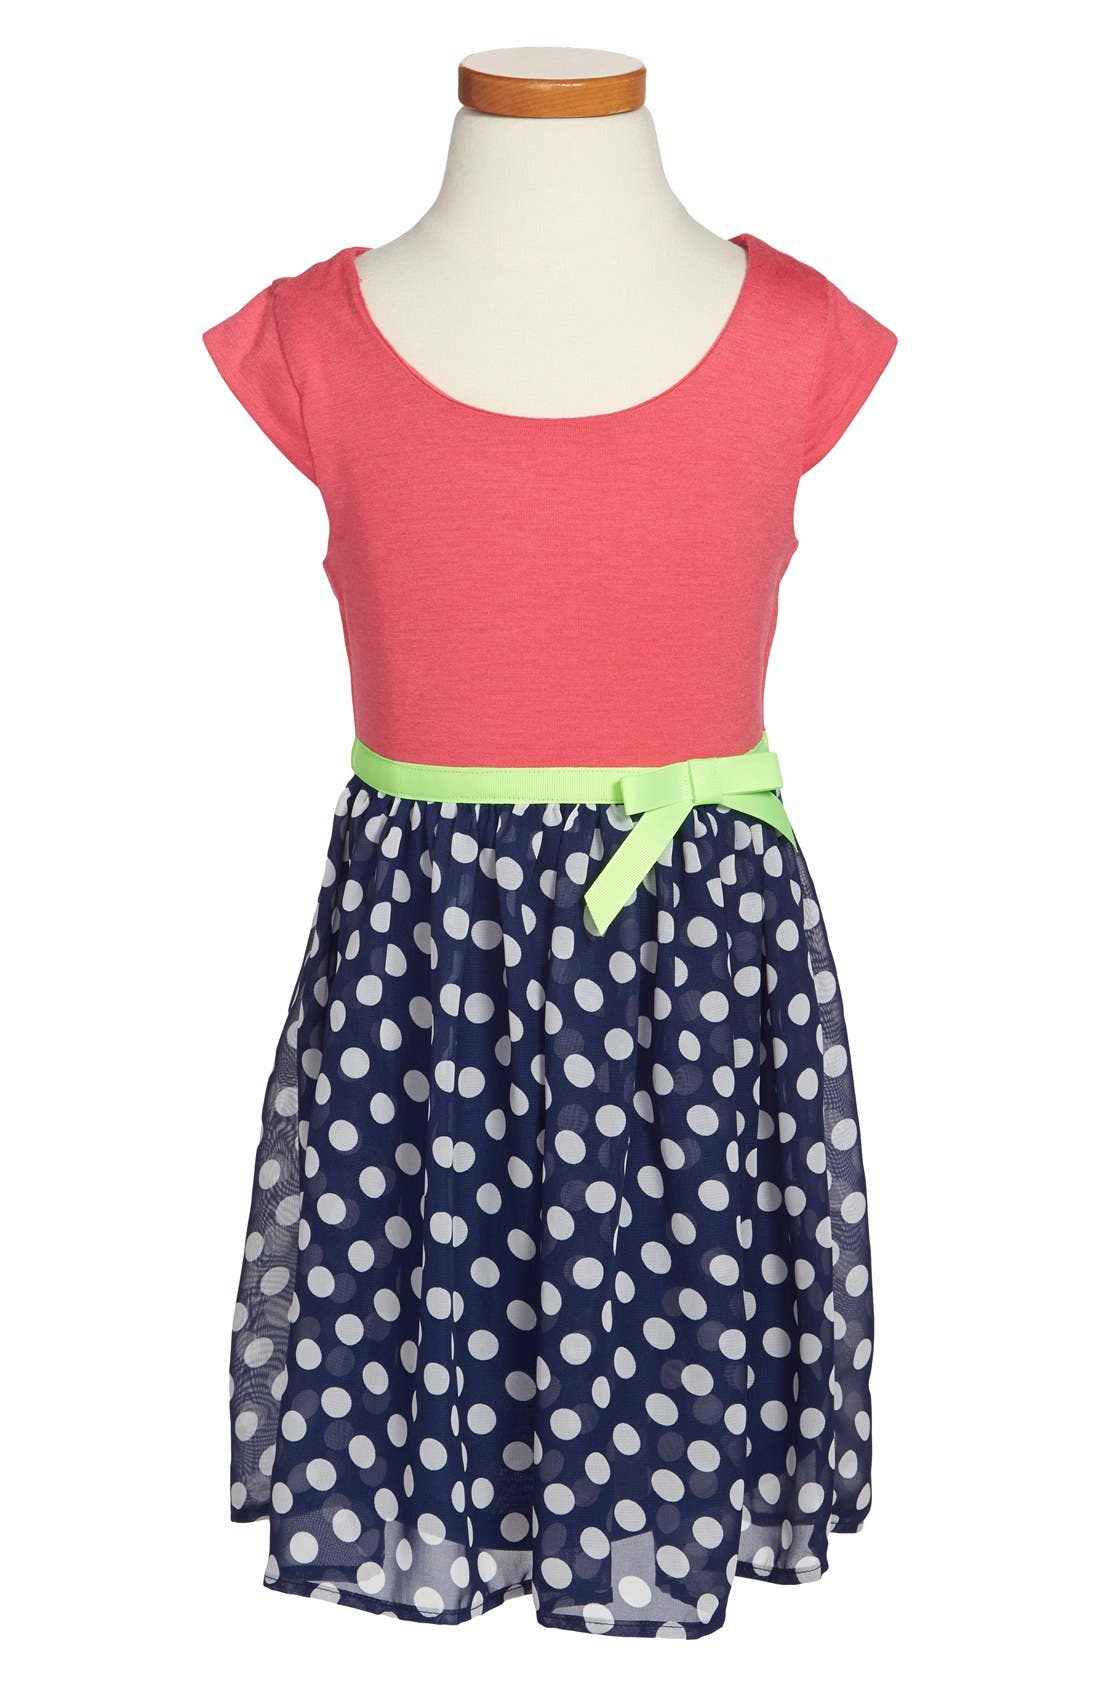 Alternate Image 1 Selected - Zunie Cap Sleeve Floral Print Dress (Toddler Girls, Little Girls & Big Girls)